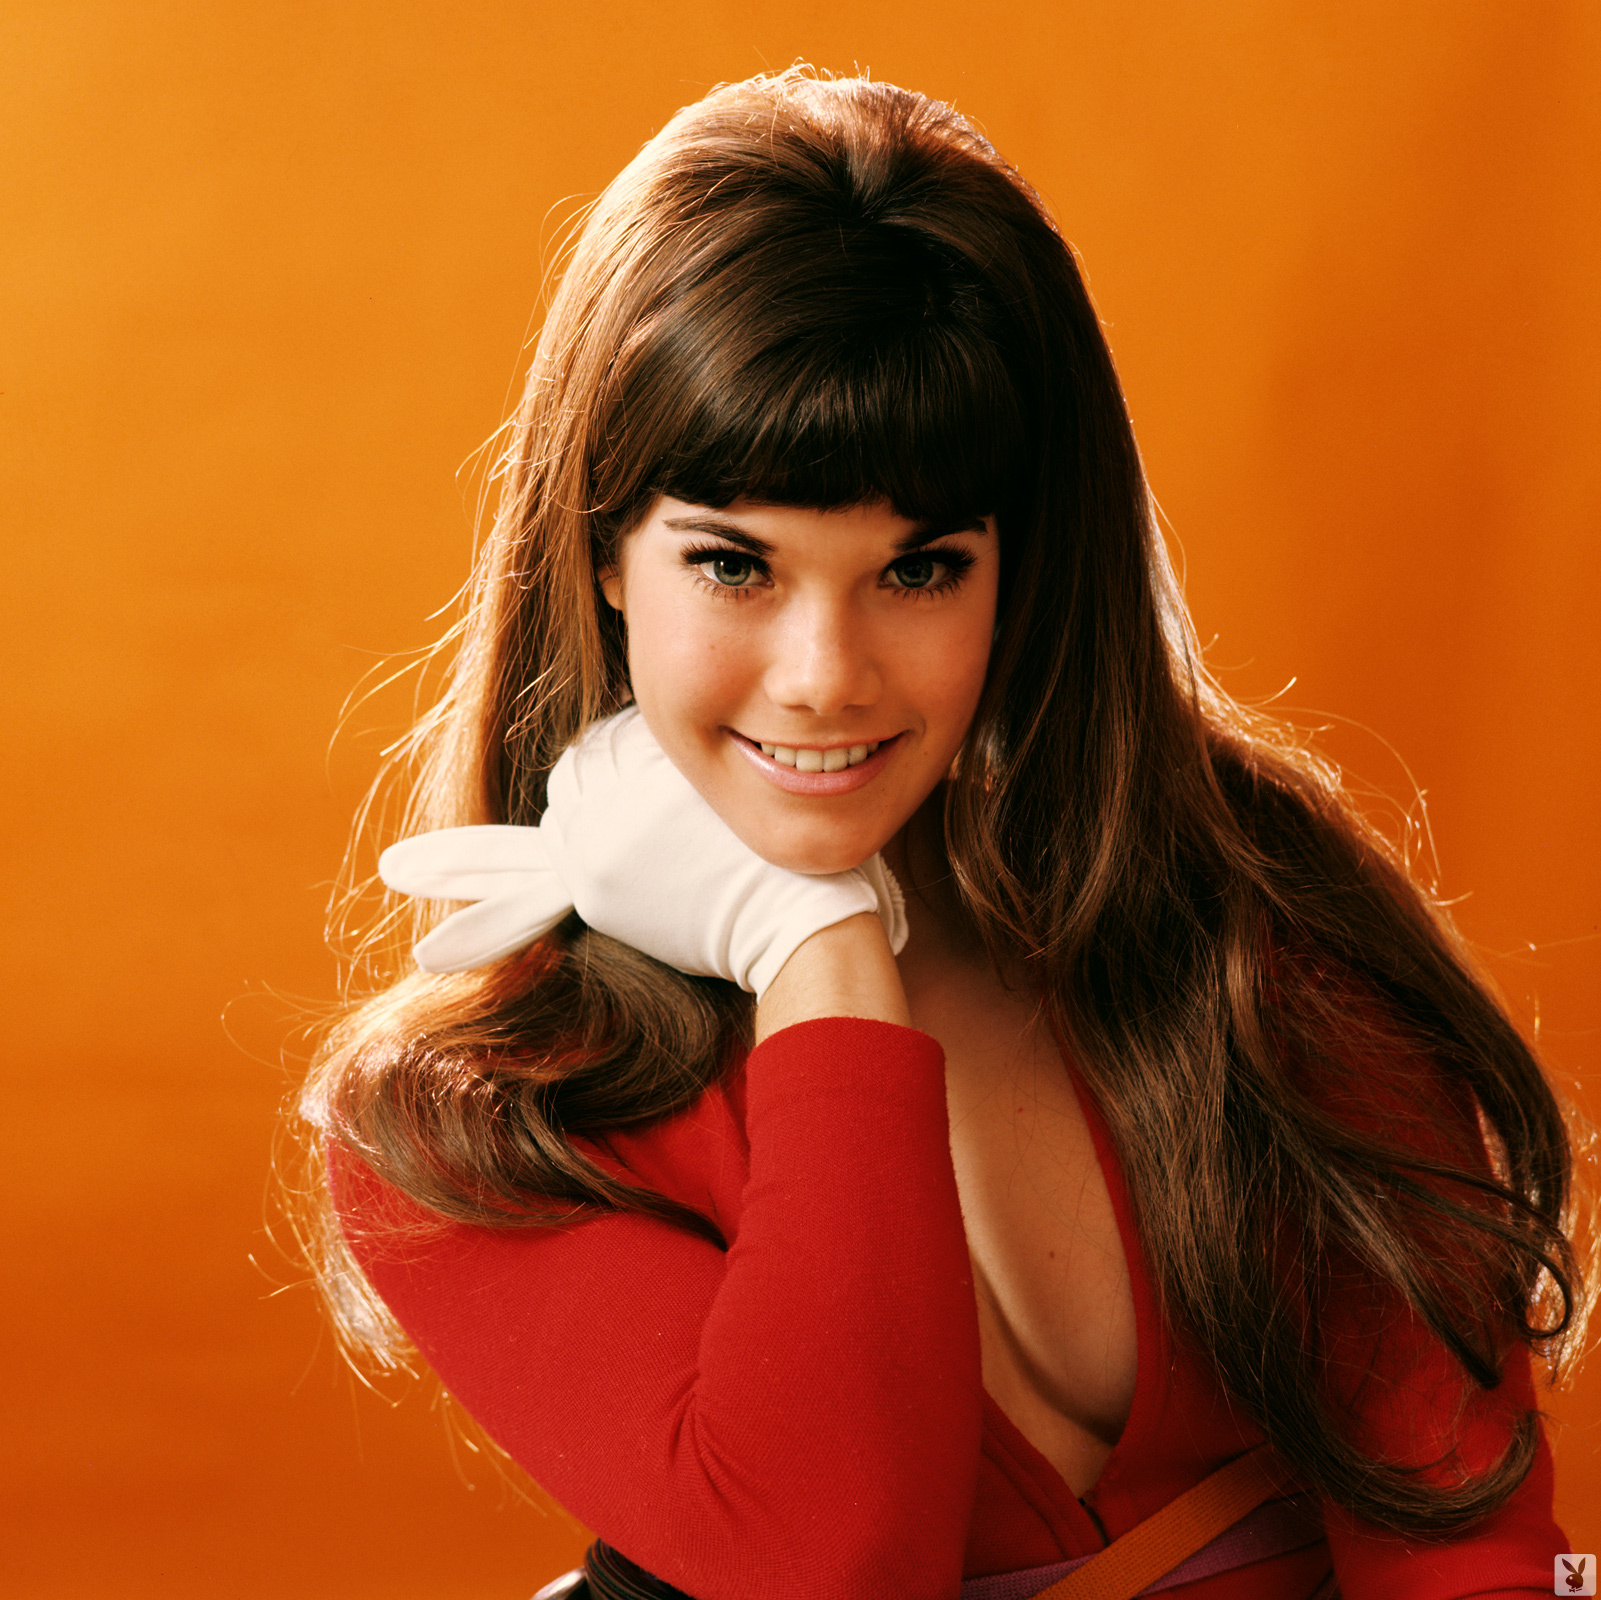 Barbi Benton (3)